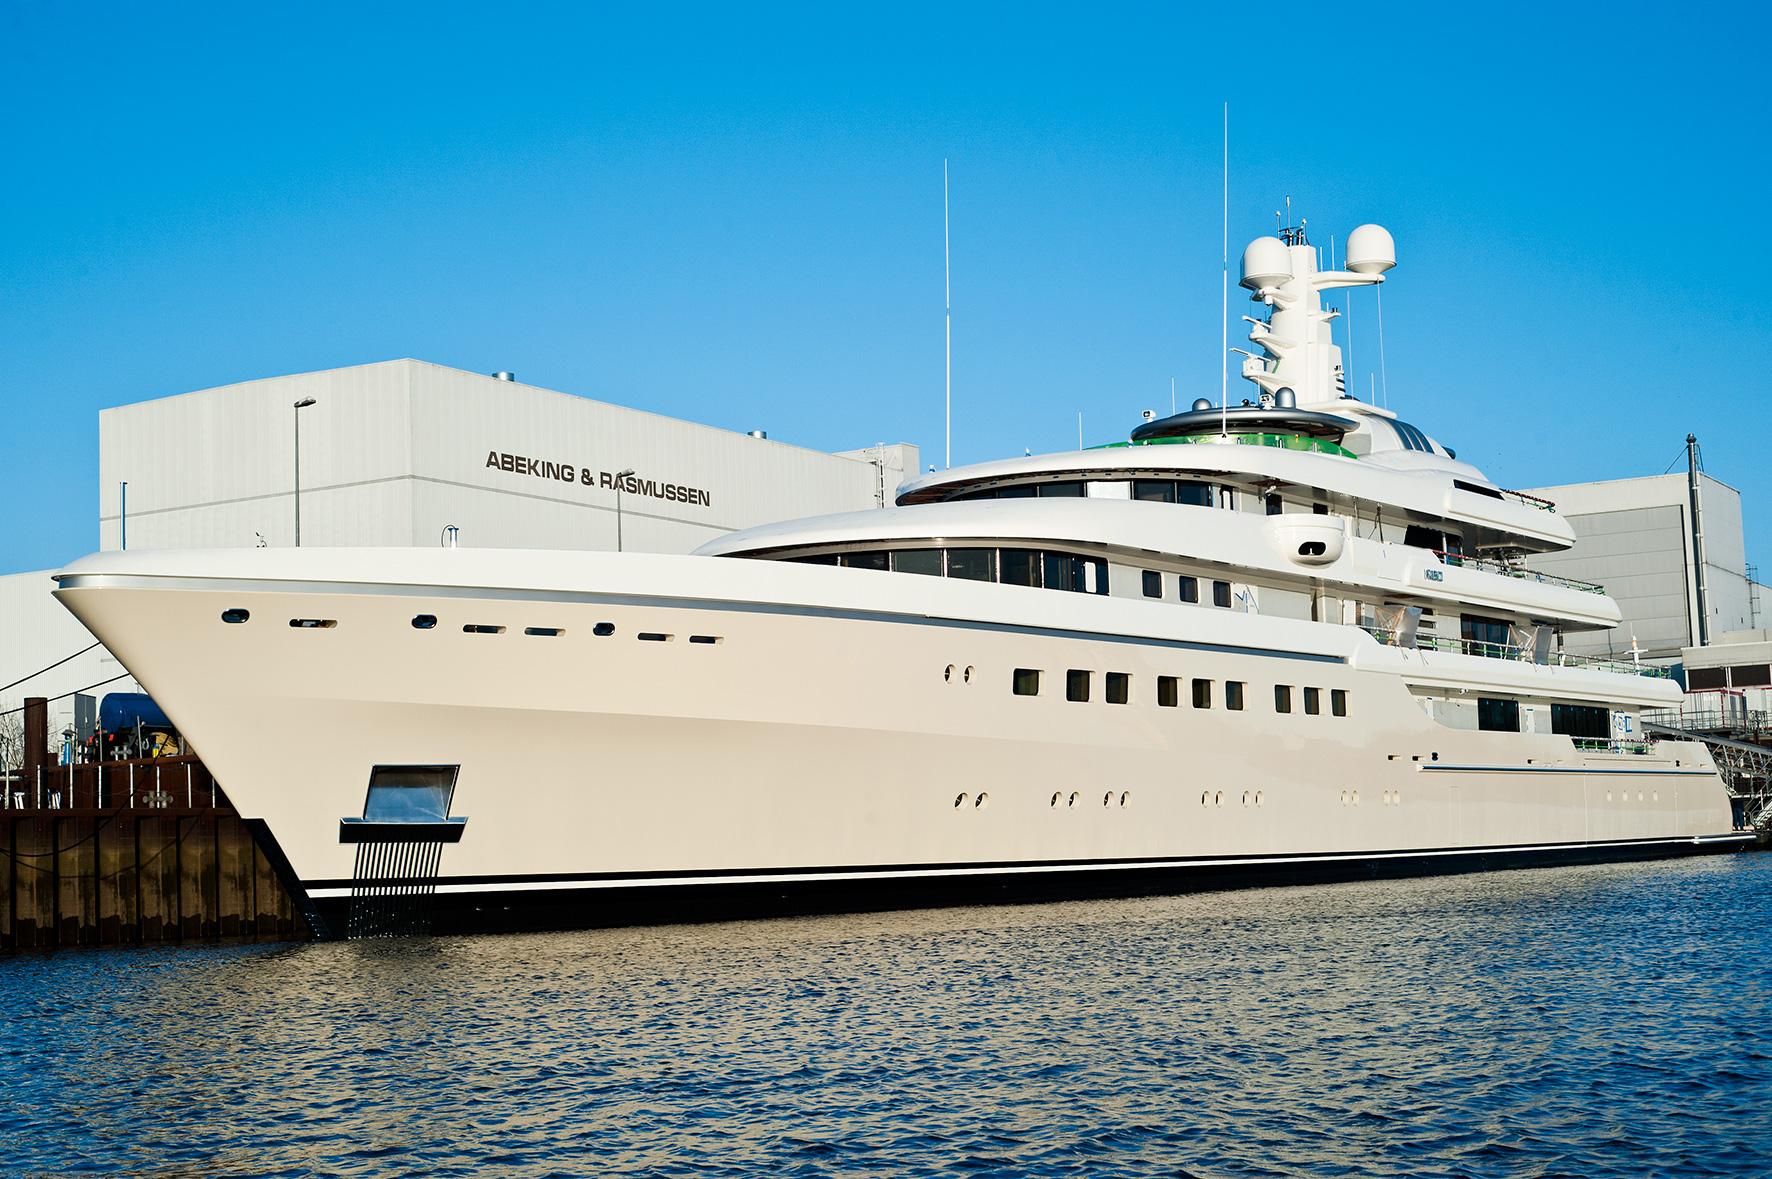 Abeking Rasmussen Superyacht KIBO Hull 6497 Luxury